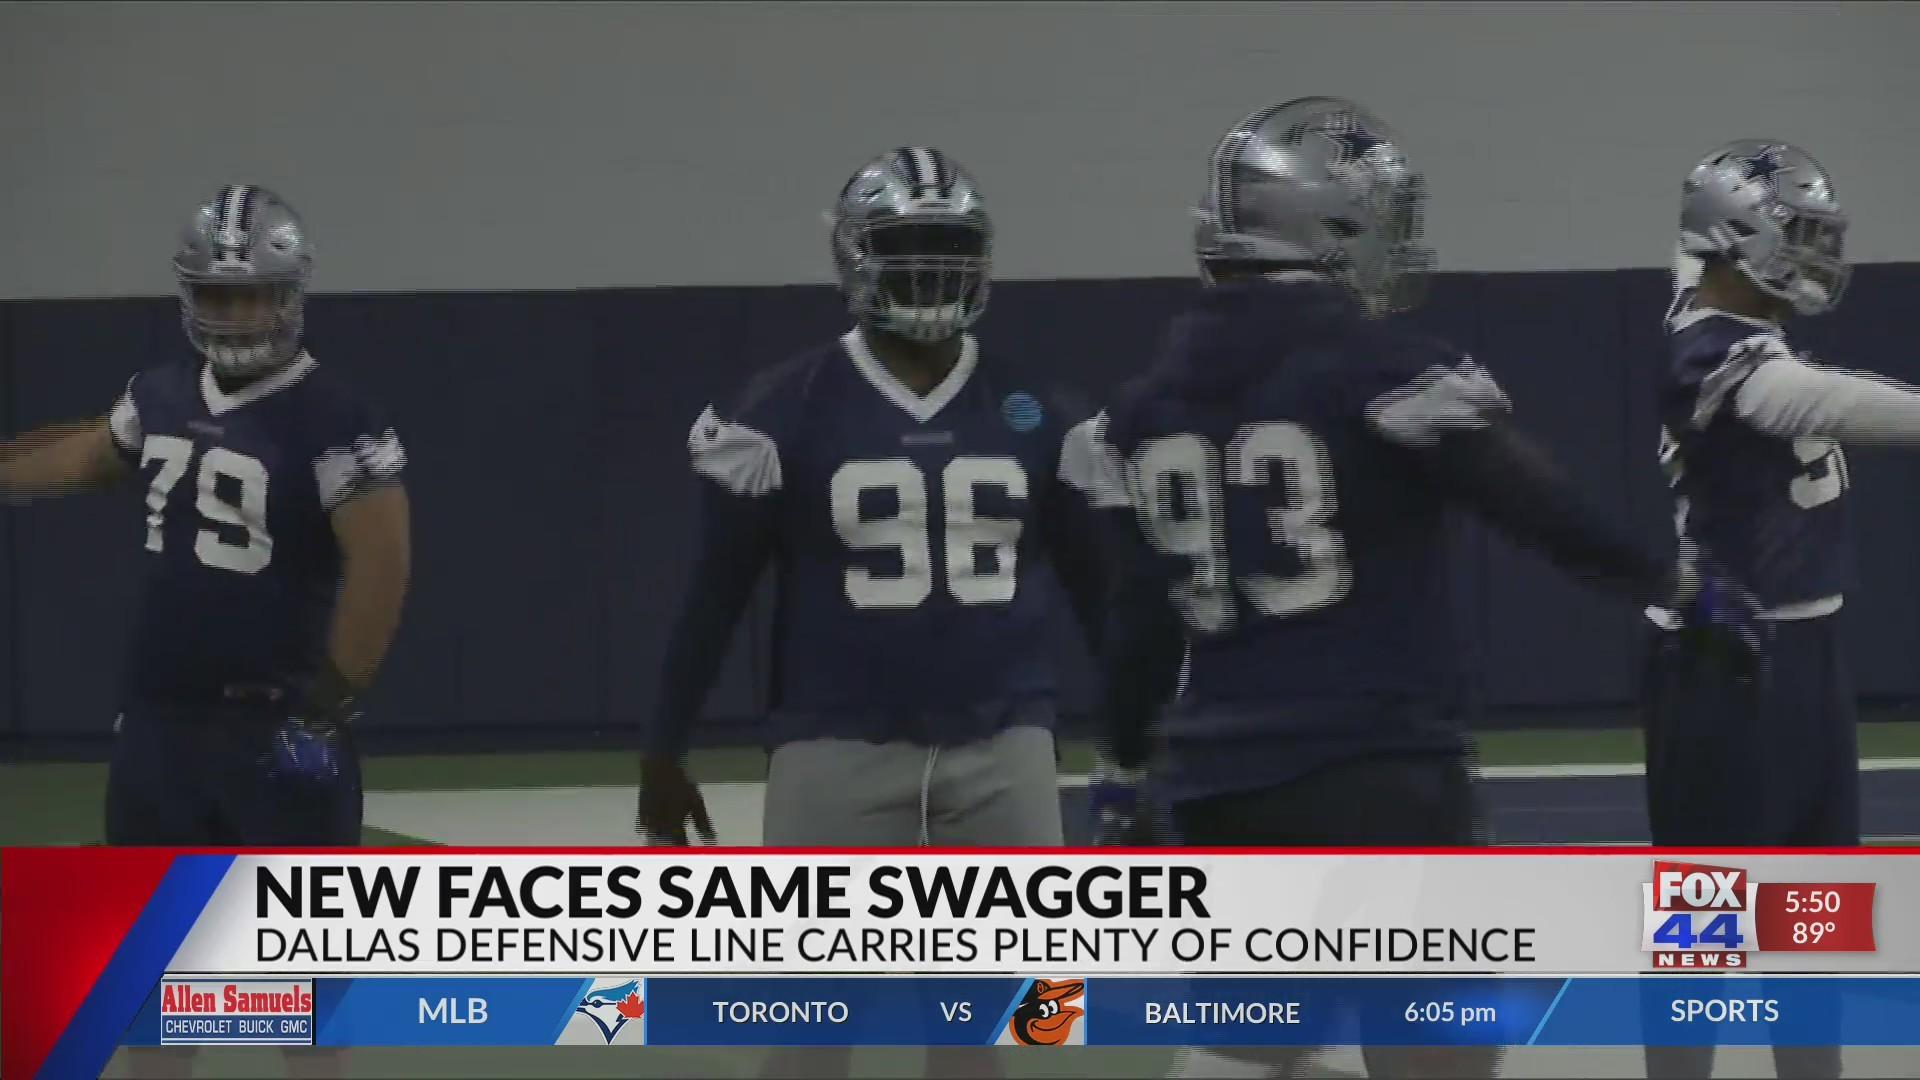 Dallas Cowboys: New Faces, Same Swagger